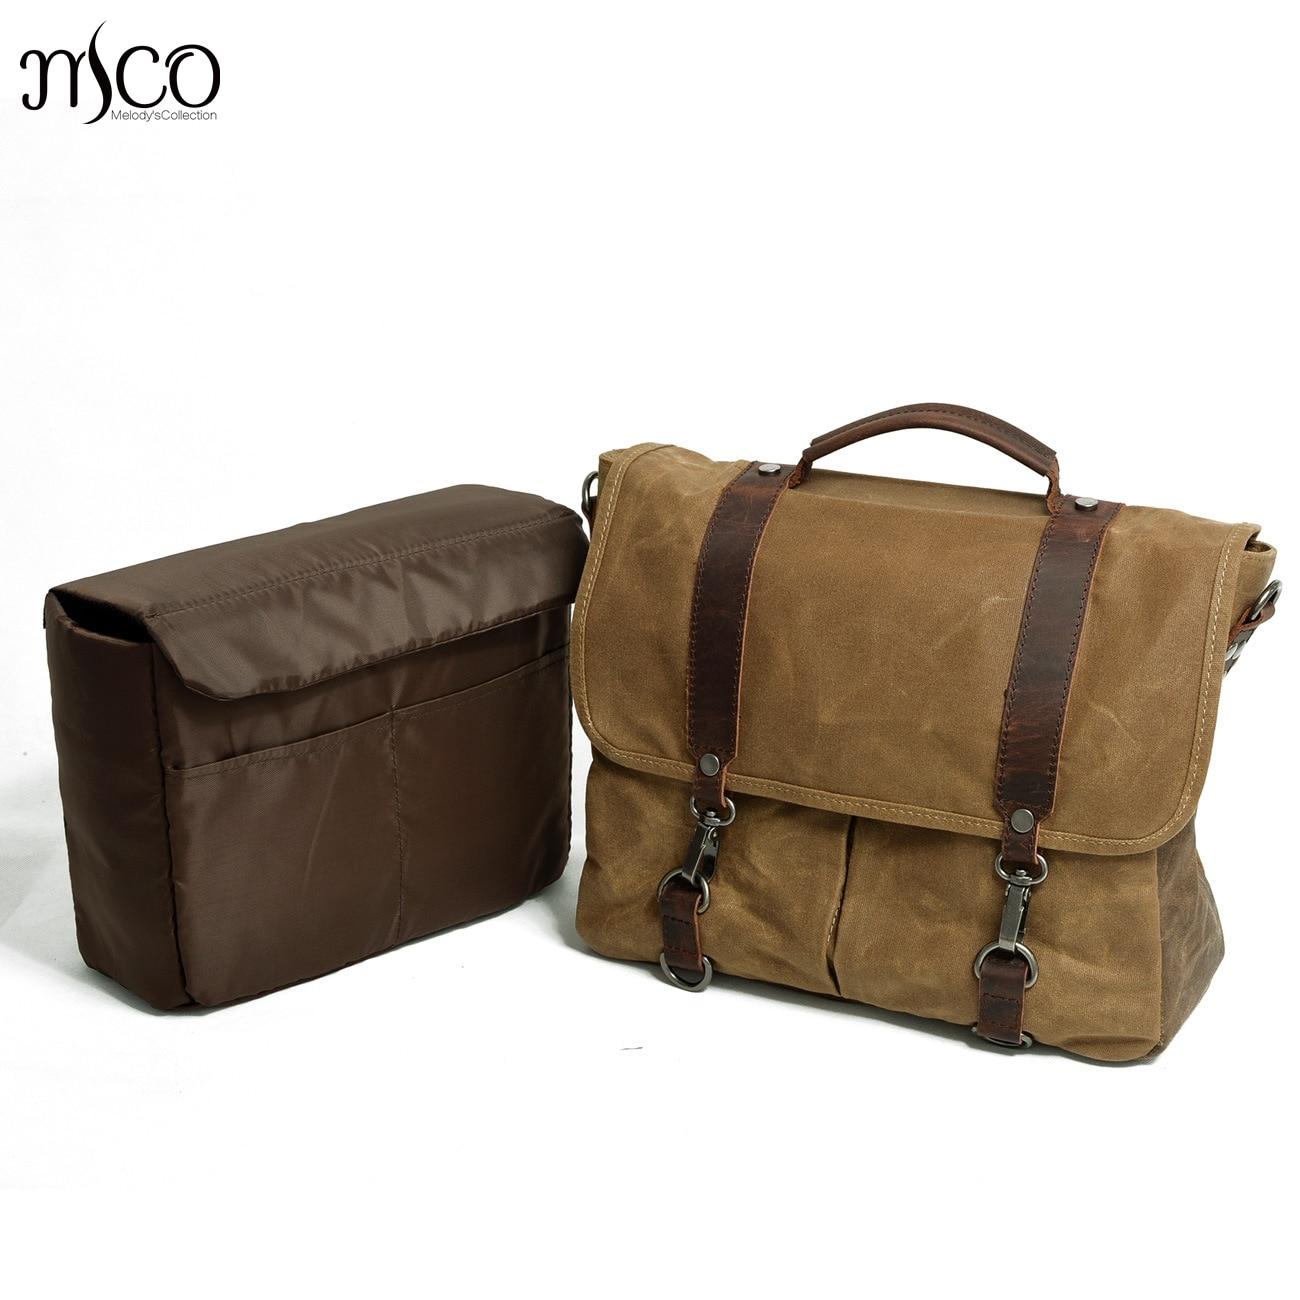 New Retro cloth waterproof Canvas Bag Charcoal Waxed Shoulder Portable <font><b>Photography</b></font> Camera Bag Messenger Bag